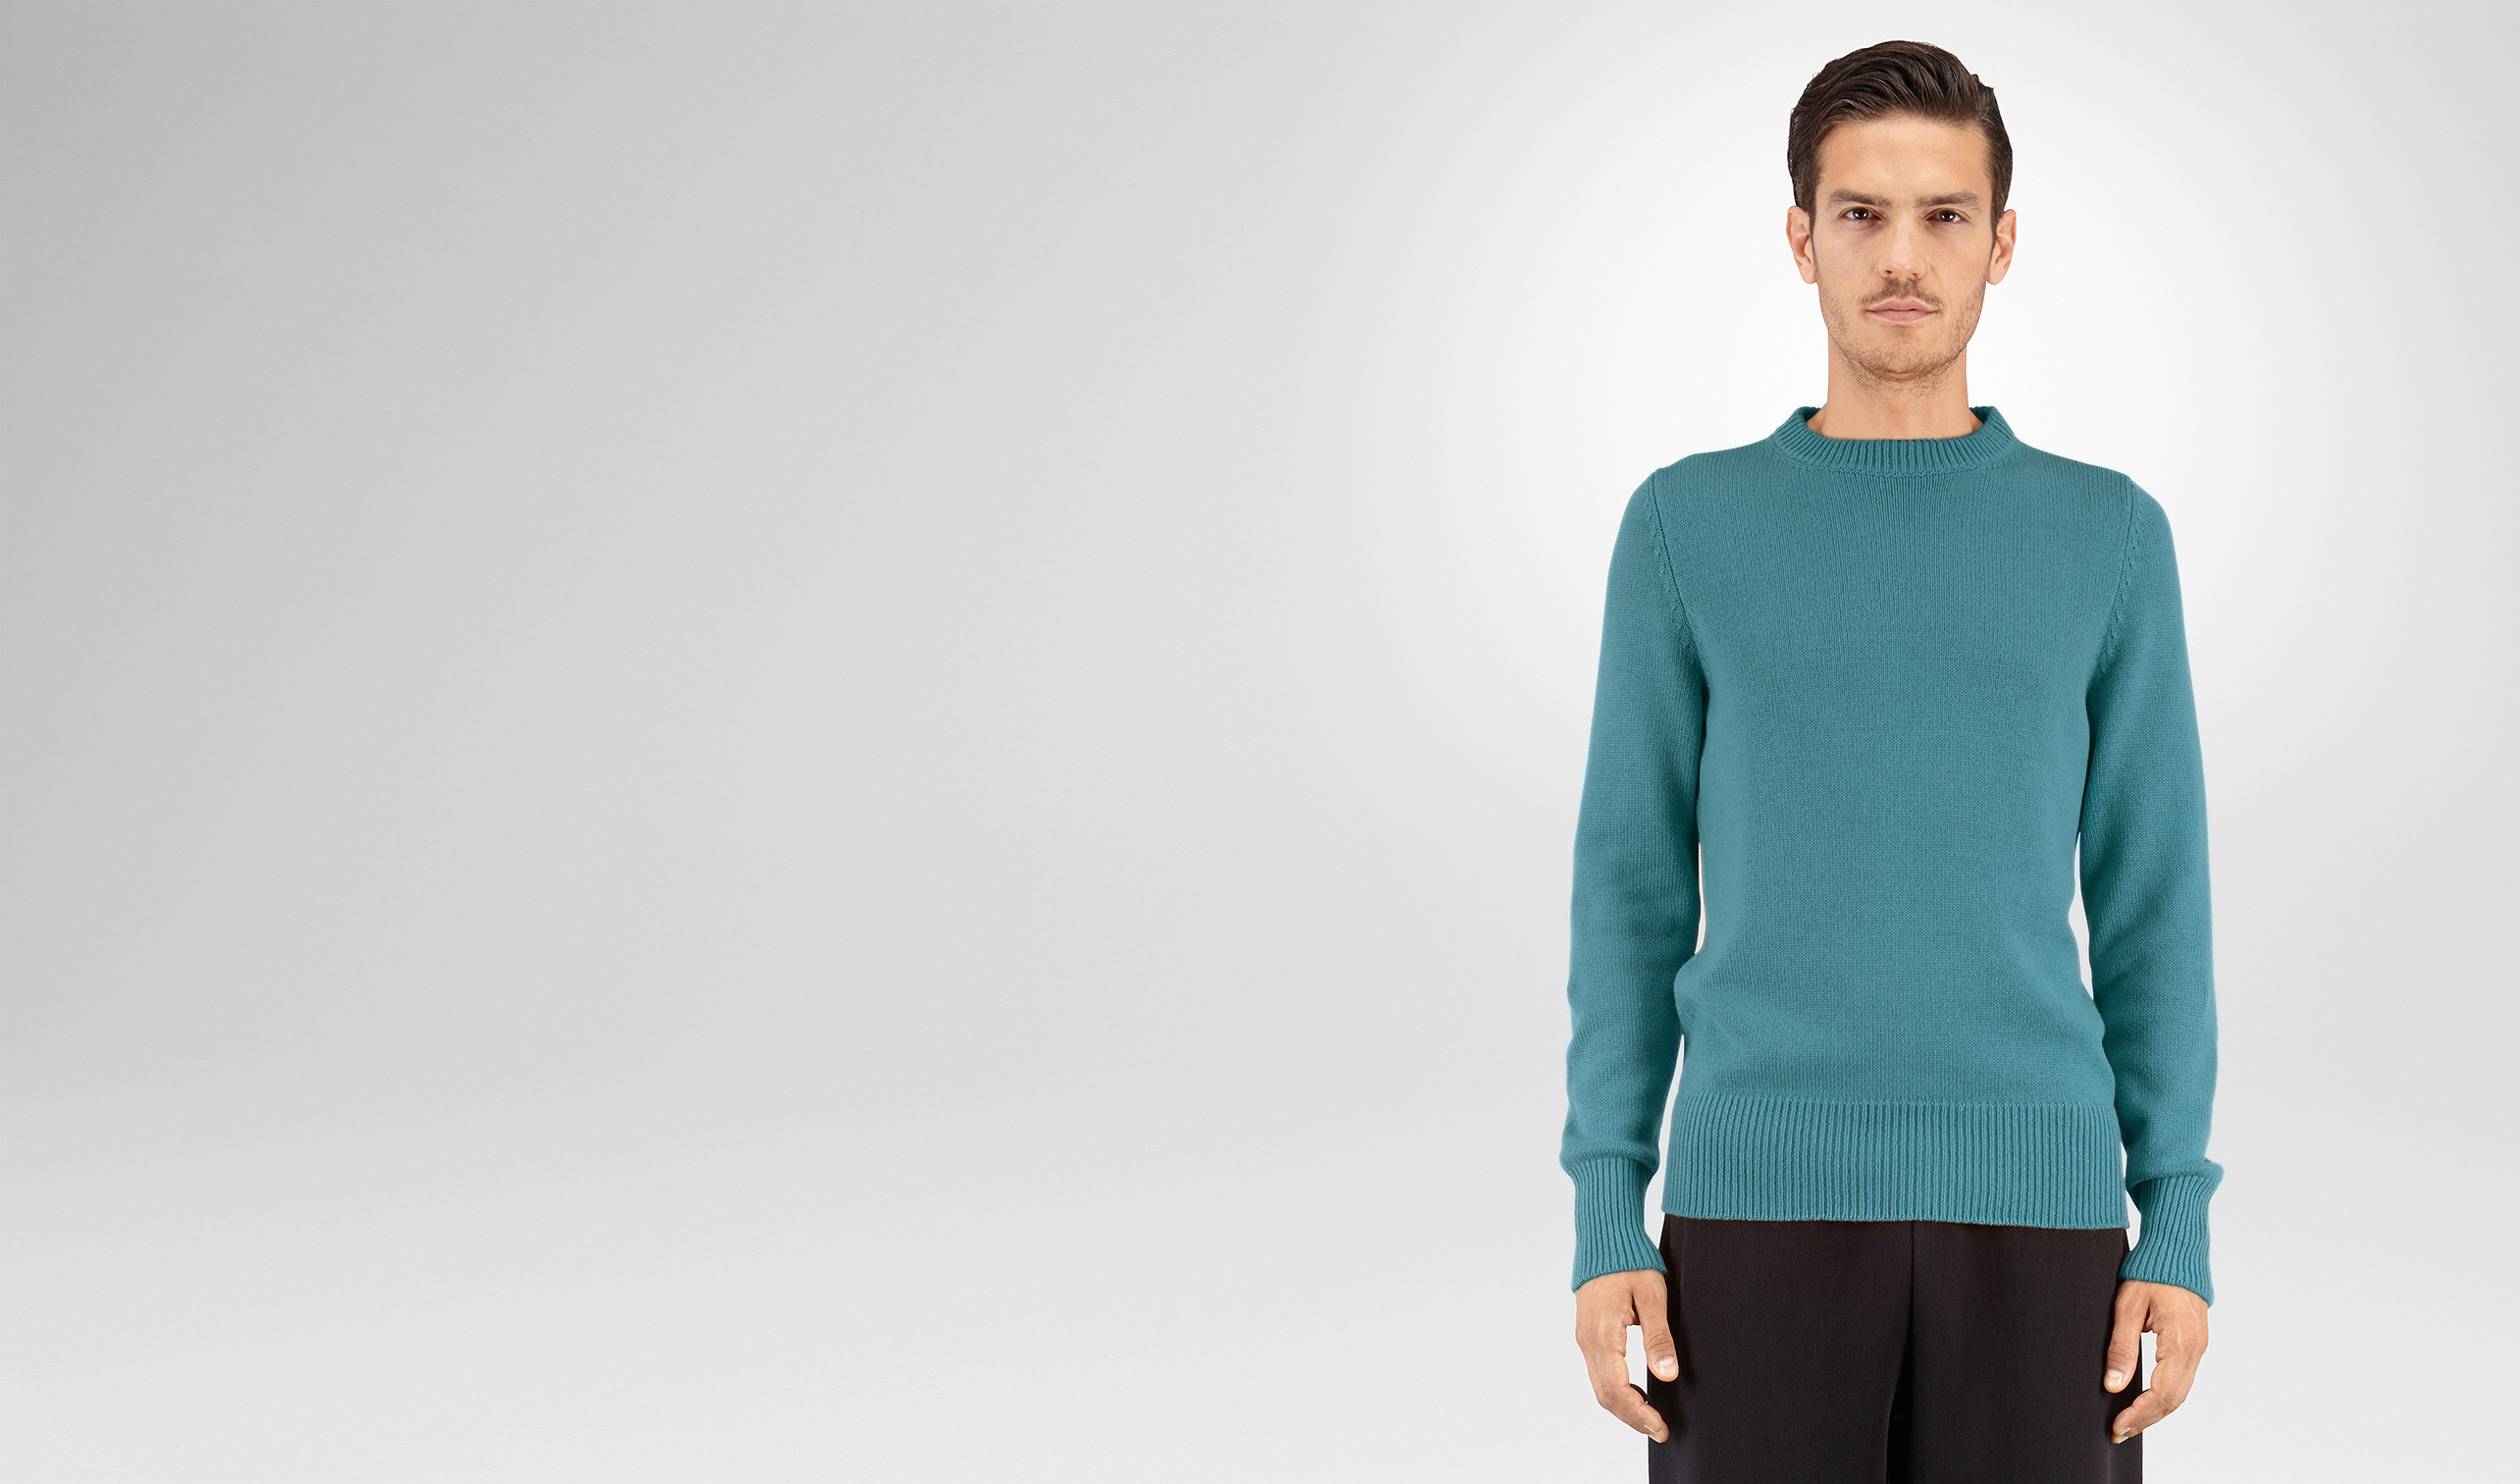 BOTTEGA VENETA Knitwear U SWEATER IN BRIGHTON CASHMERE pl